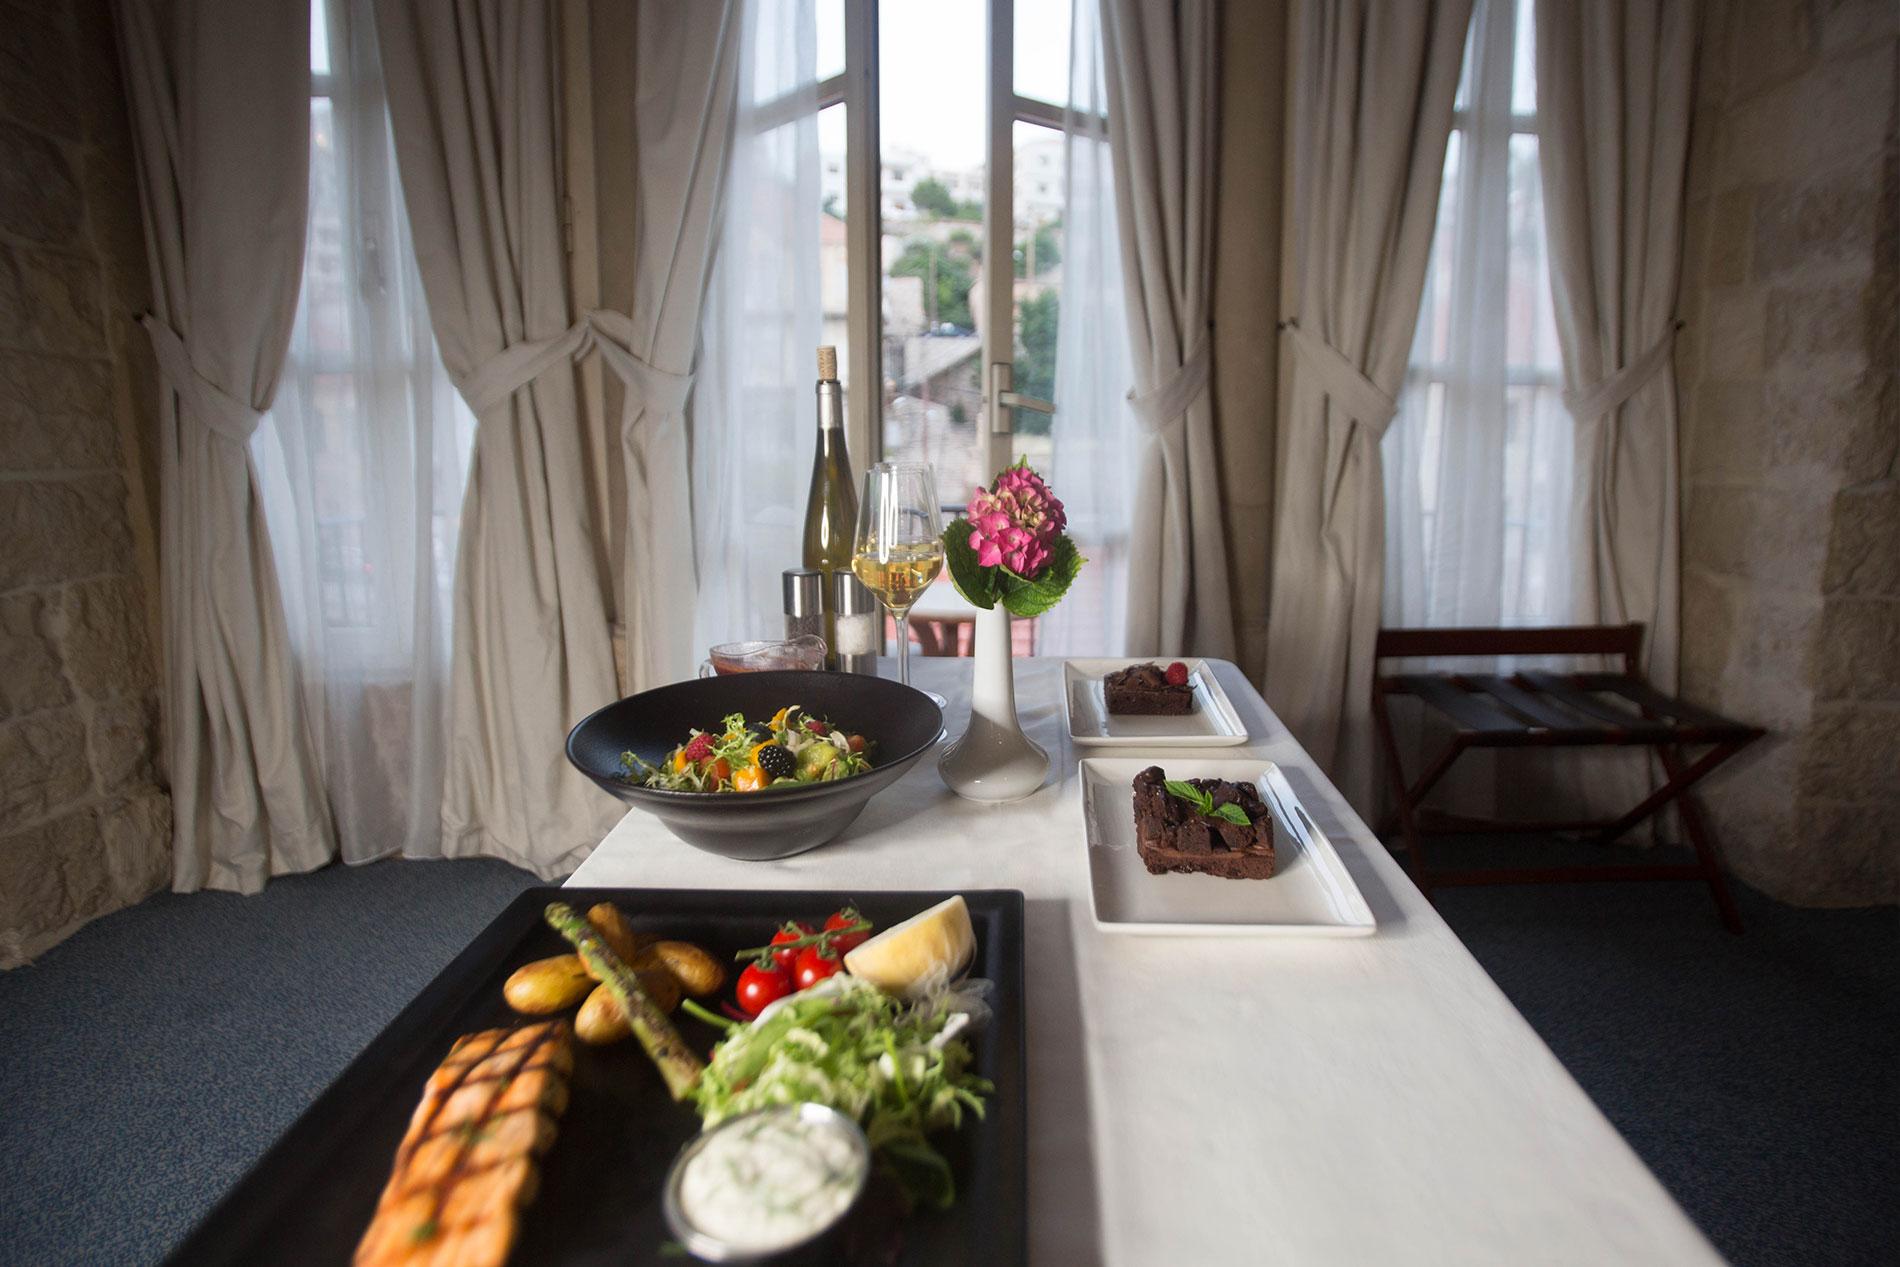 indoor room kadri and food service